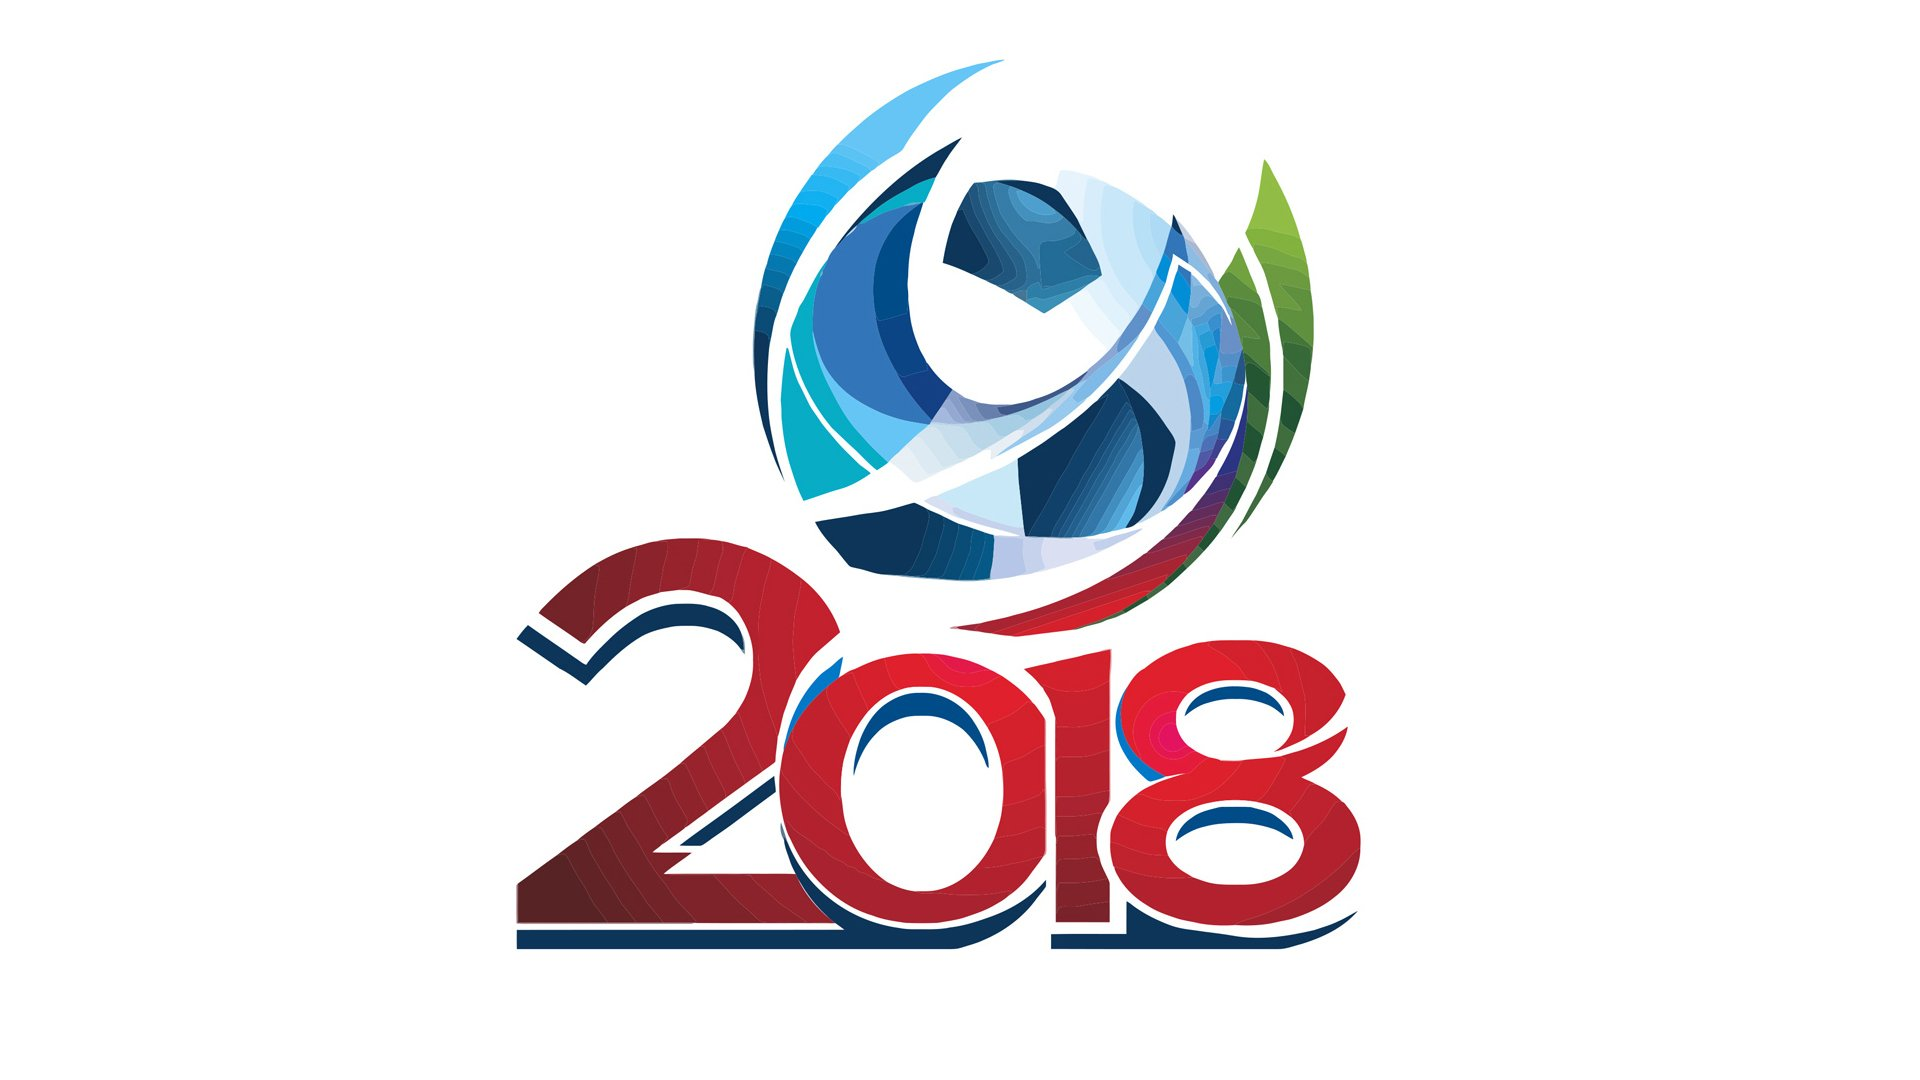 Sports - 2018 FIFA World Cup  FIFA World Cup Wallpaper